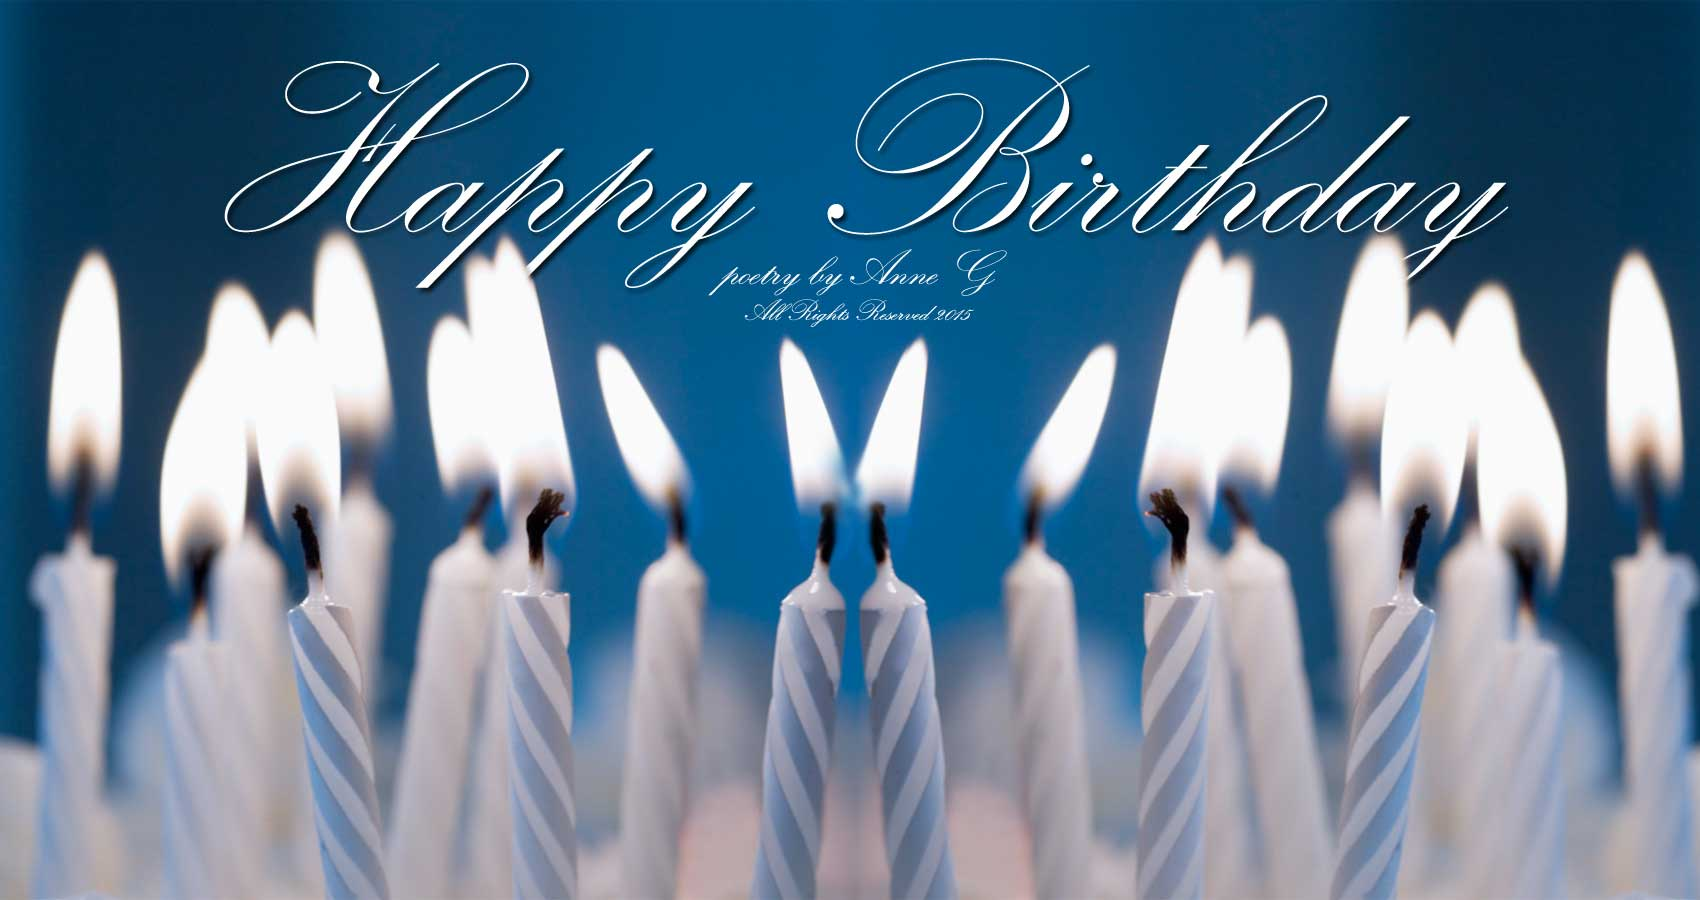 spillwords.com Happy Birthday by Anne G